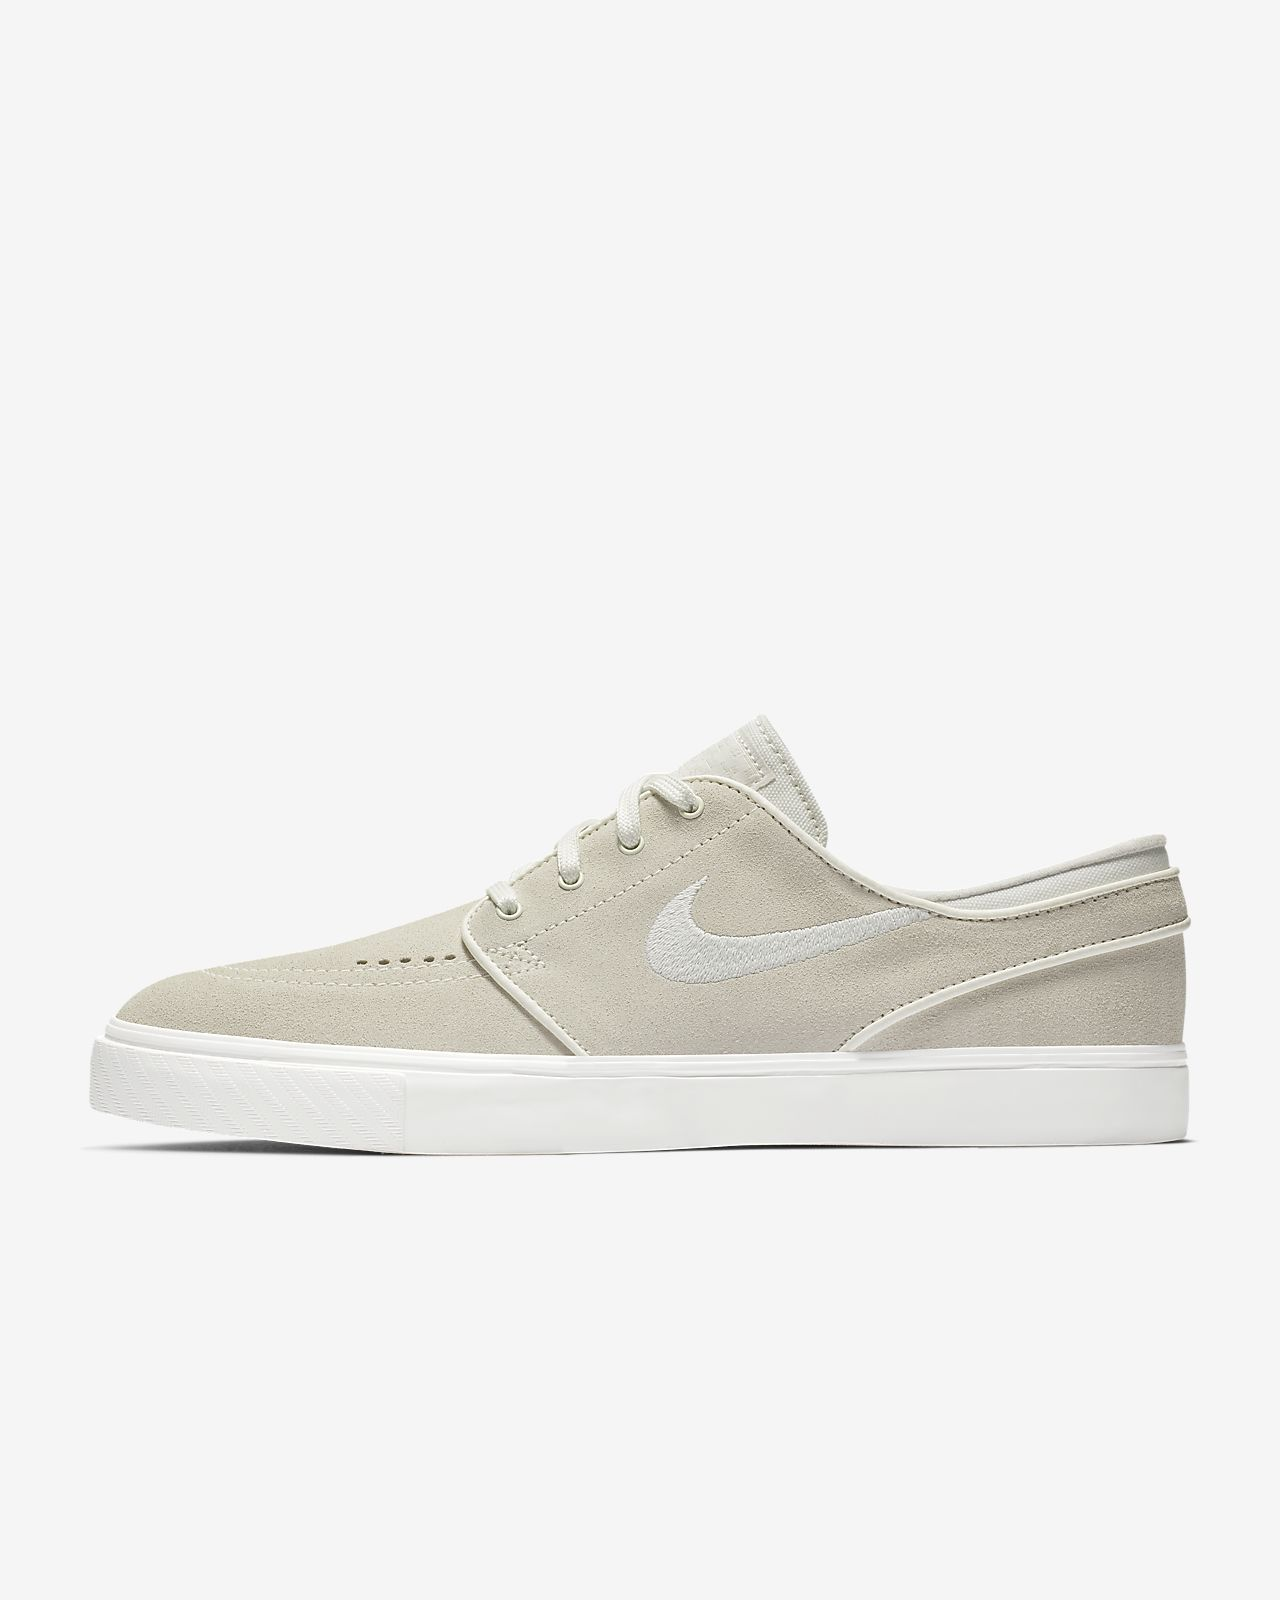 first rate 7187c 62efb ... Nike Zoom Stefan Janoski Herren-Skateboardschuh